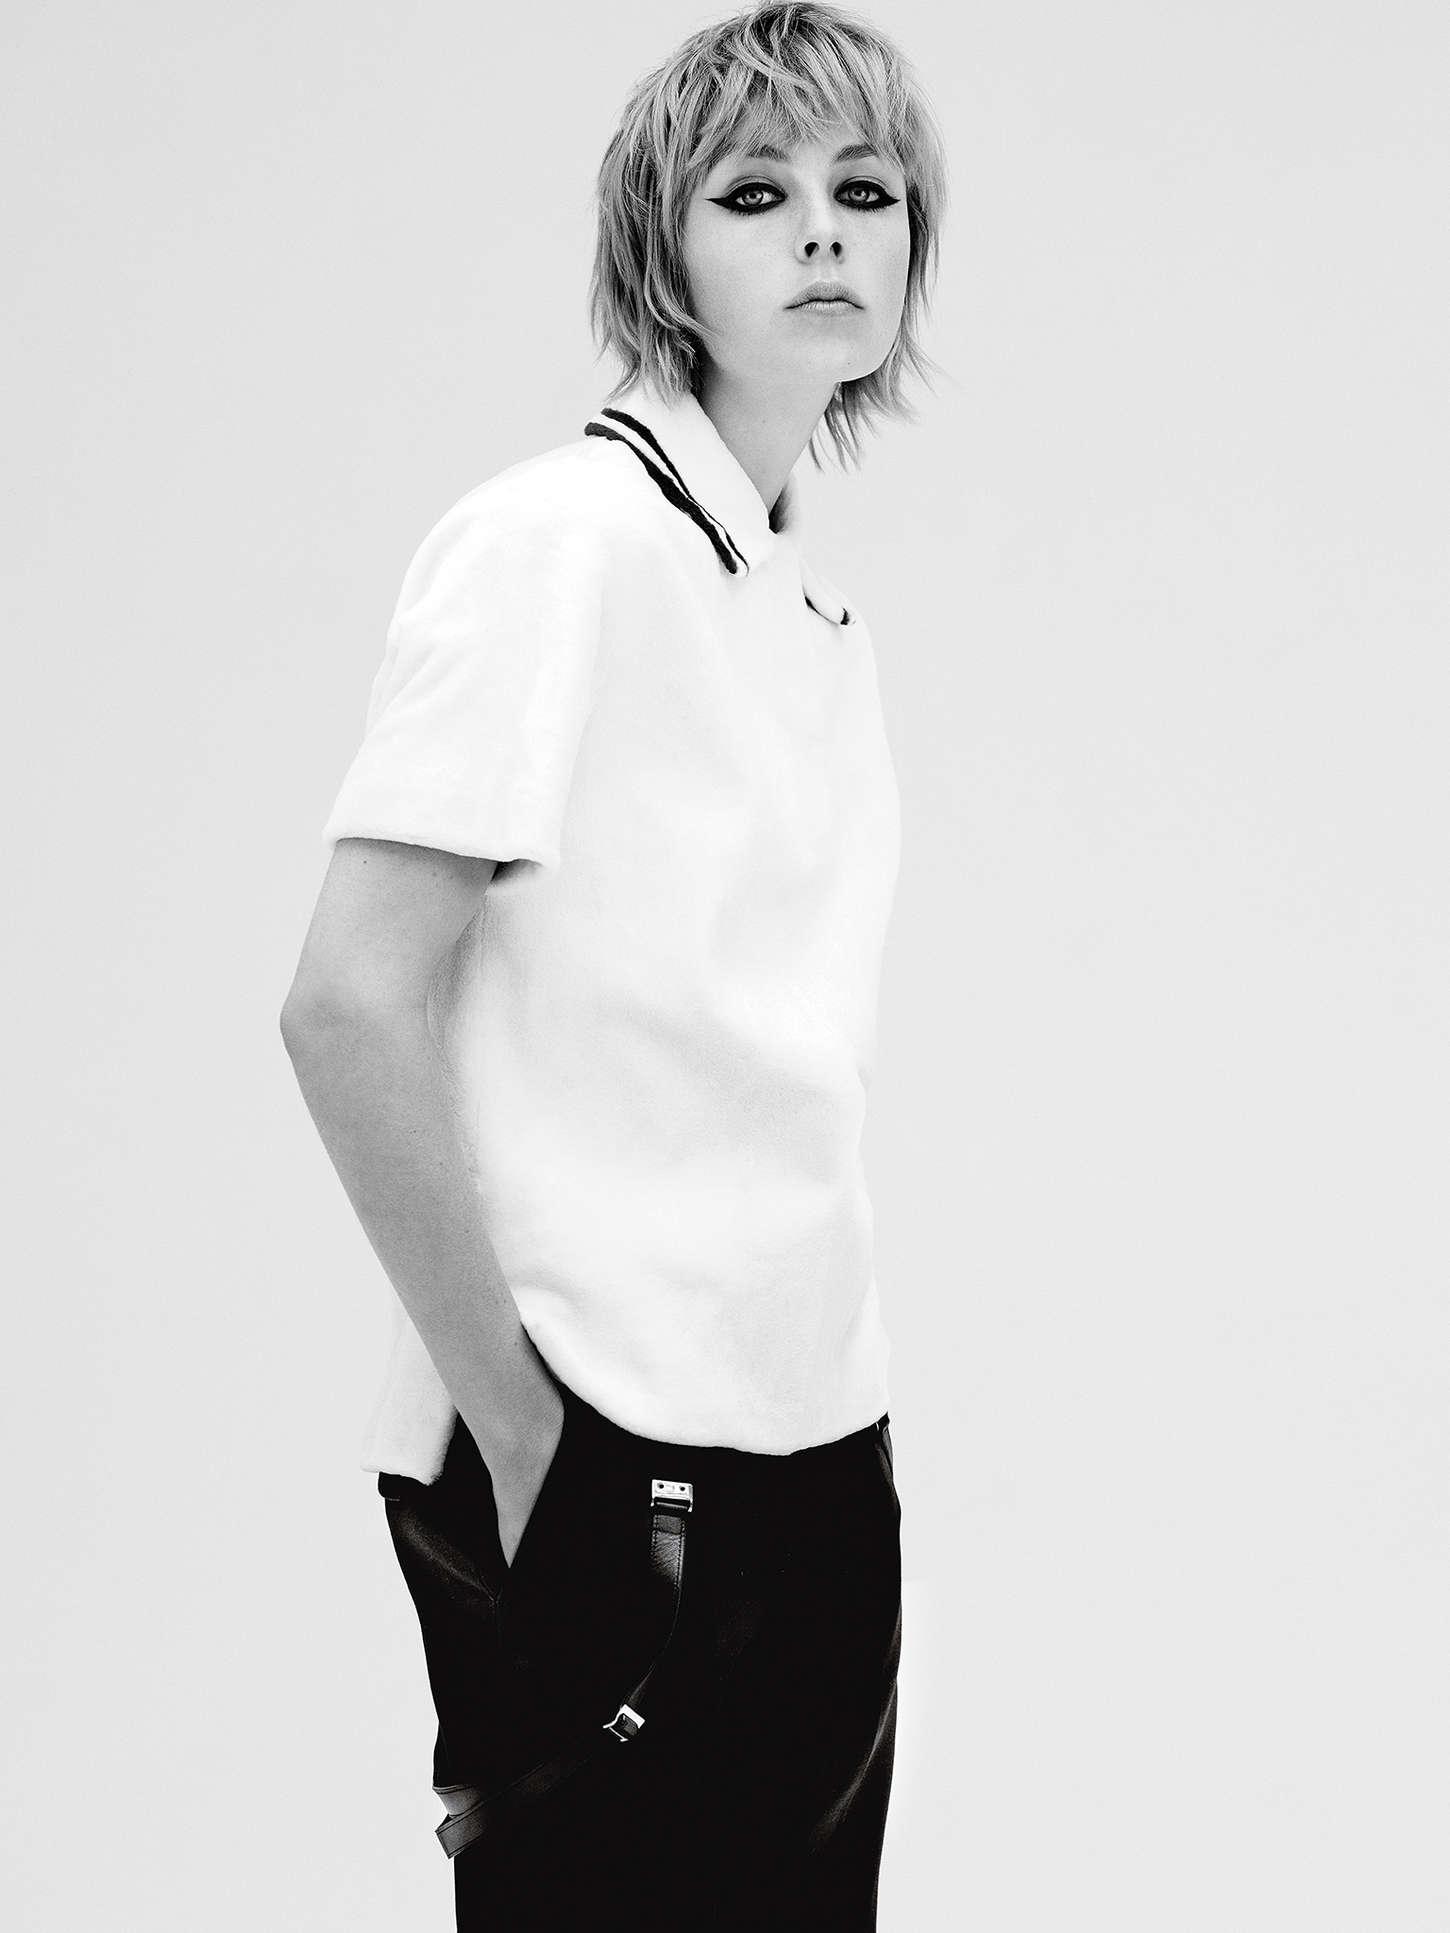 Edie Campbell 2015 : Edie Campbell: Madame Figaro 2015 -04